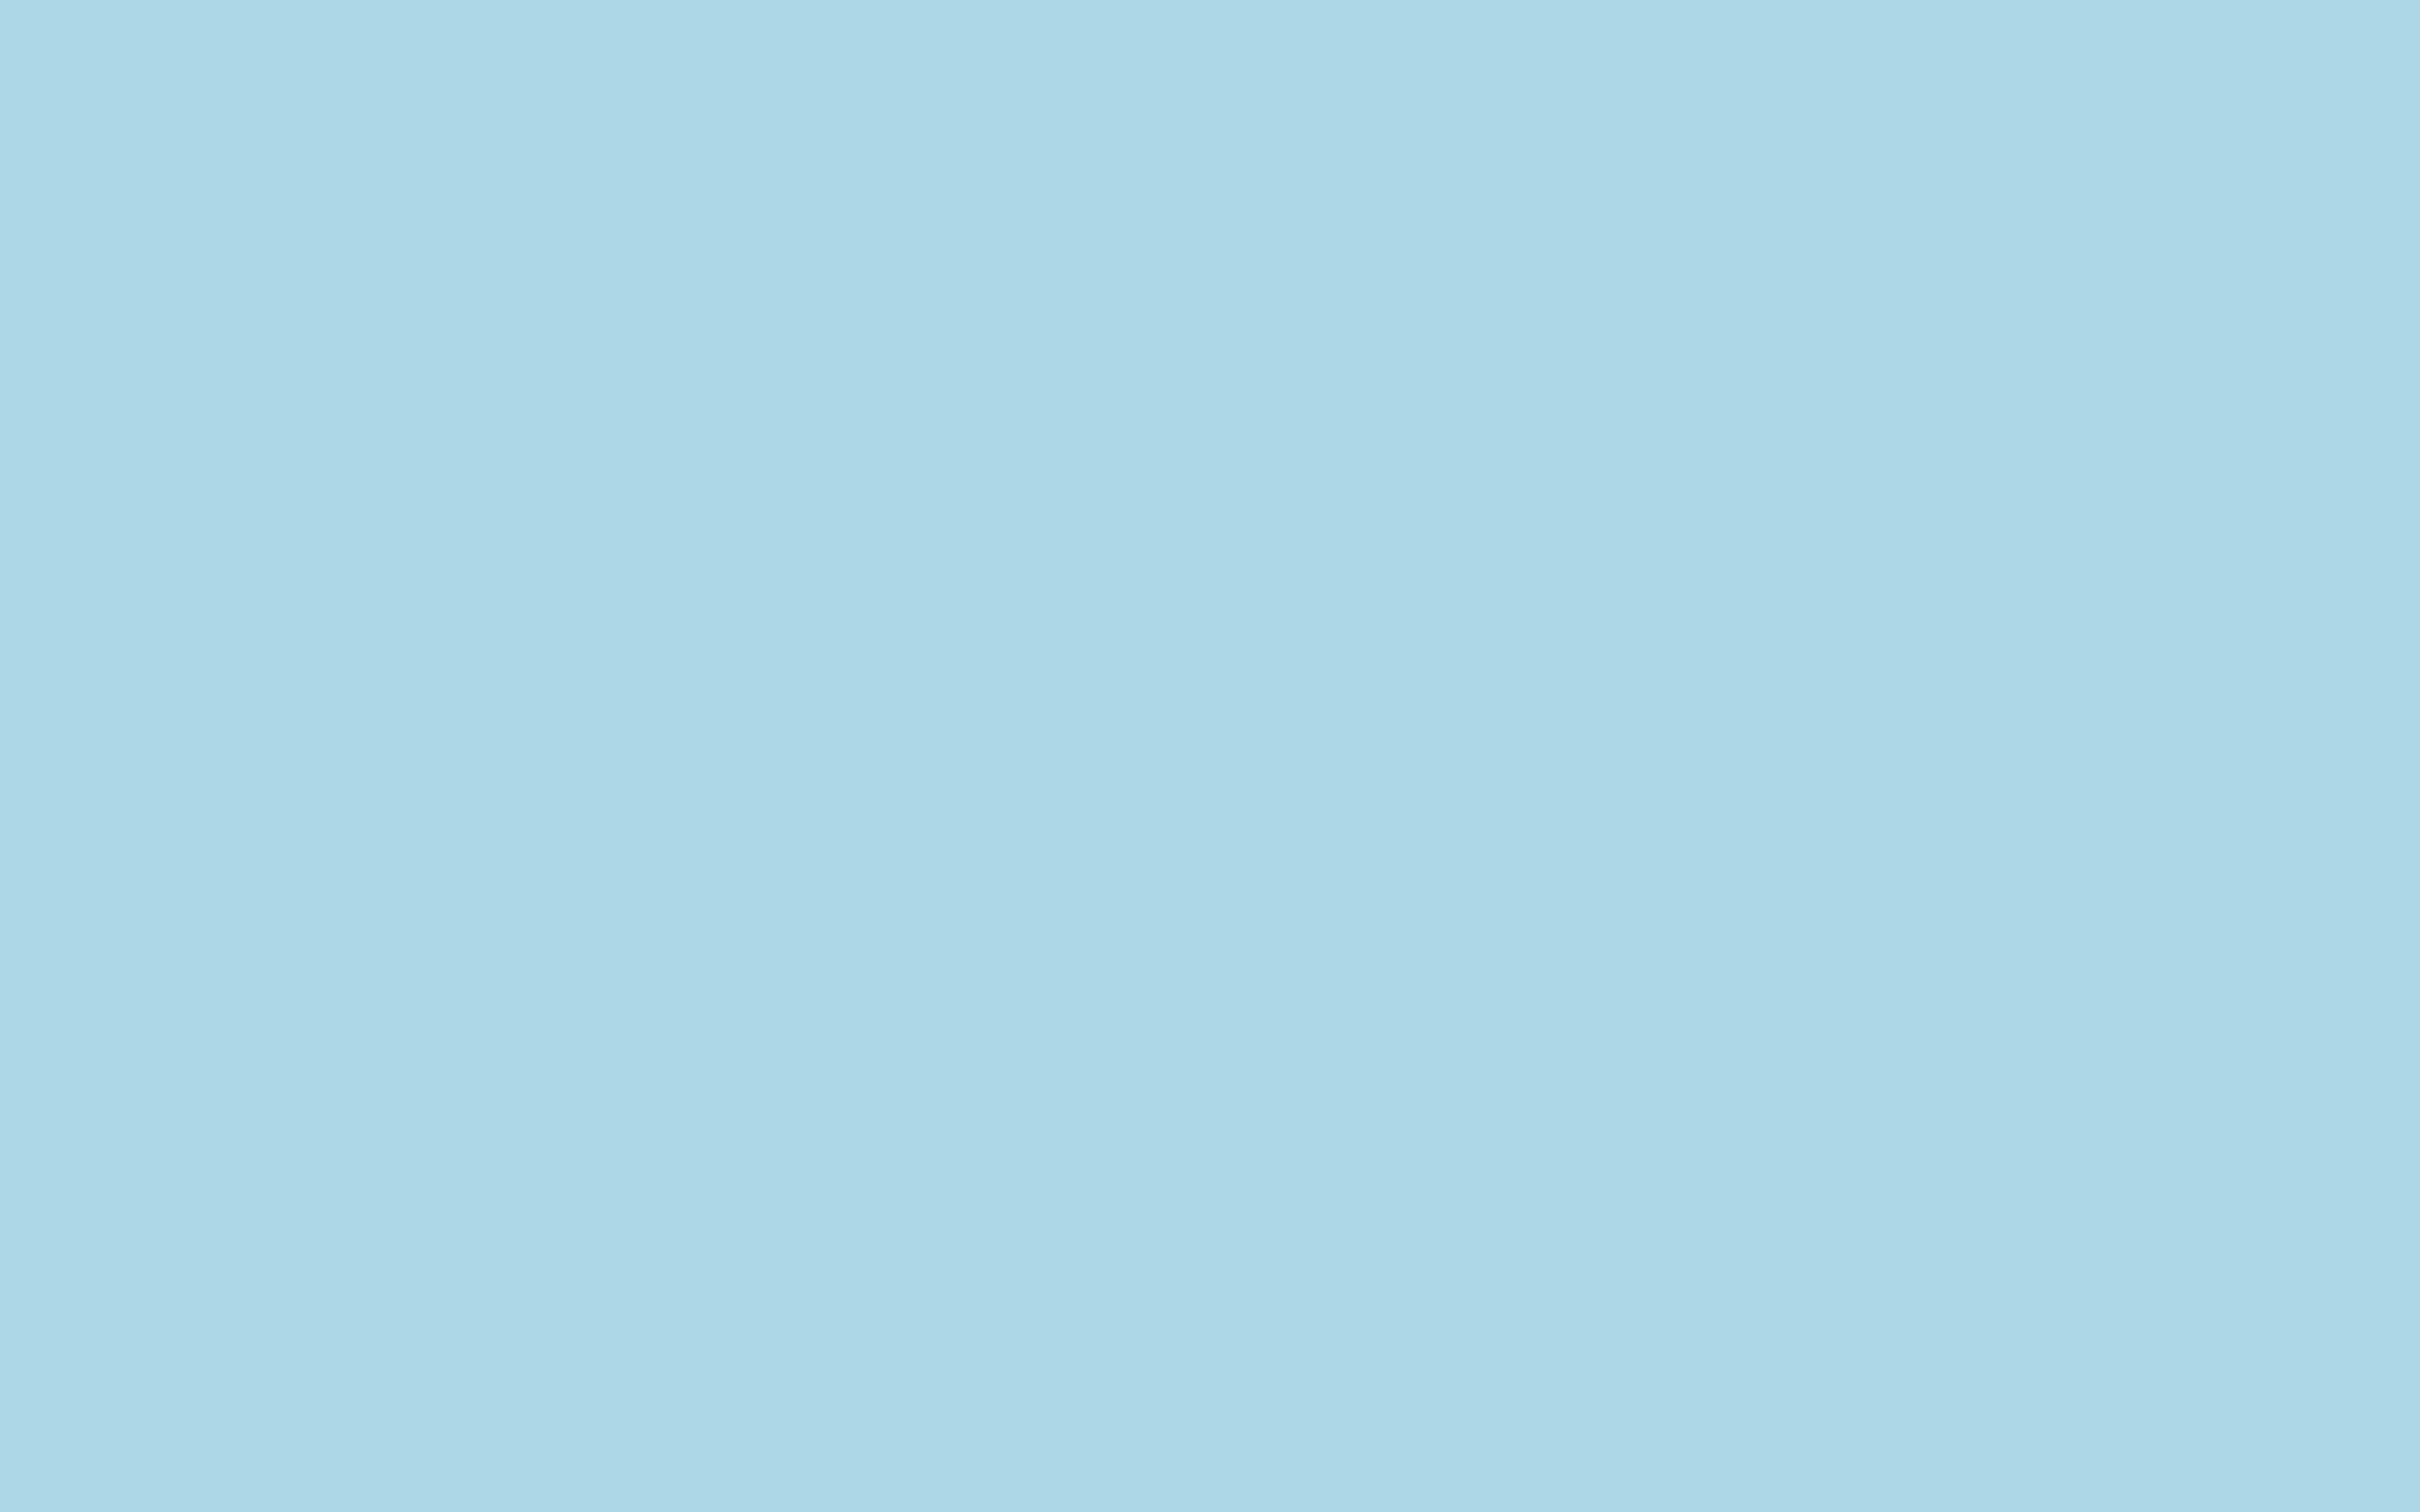 2560x1600 light blue solid color backgroundjpg   Advanced Home Health 2560x1600